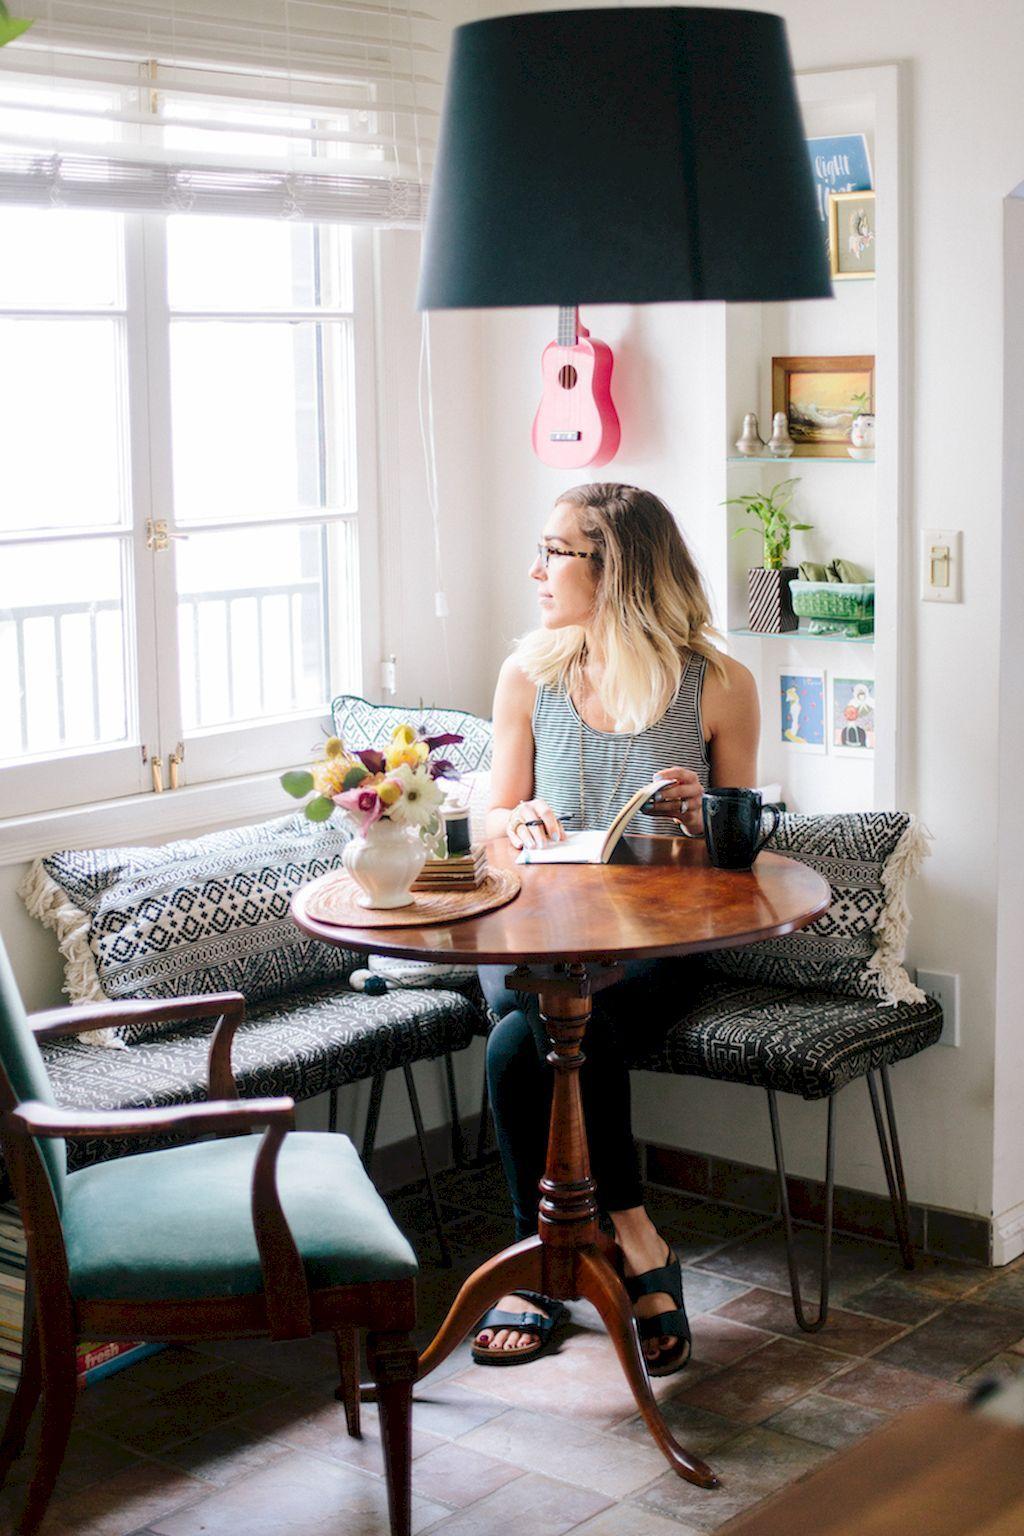 80 Small Kitchen Design & Organization Ideas | Espacios pequeños ...